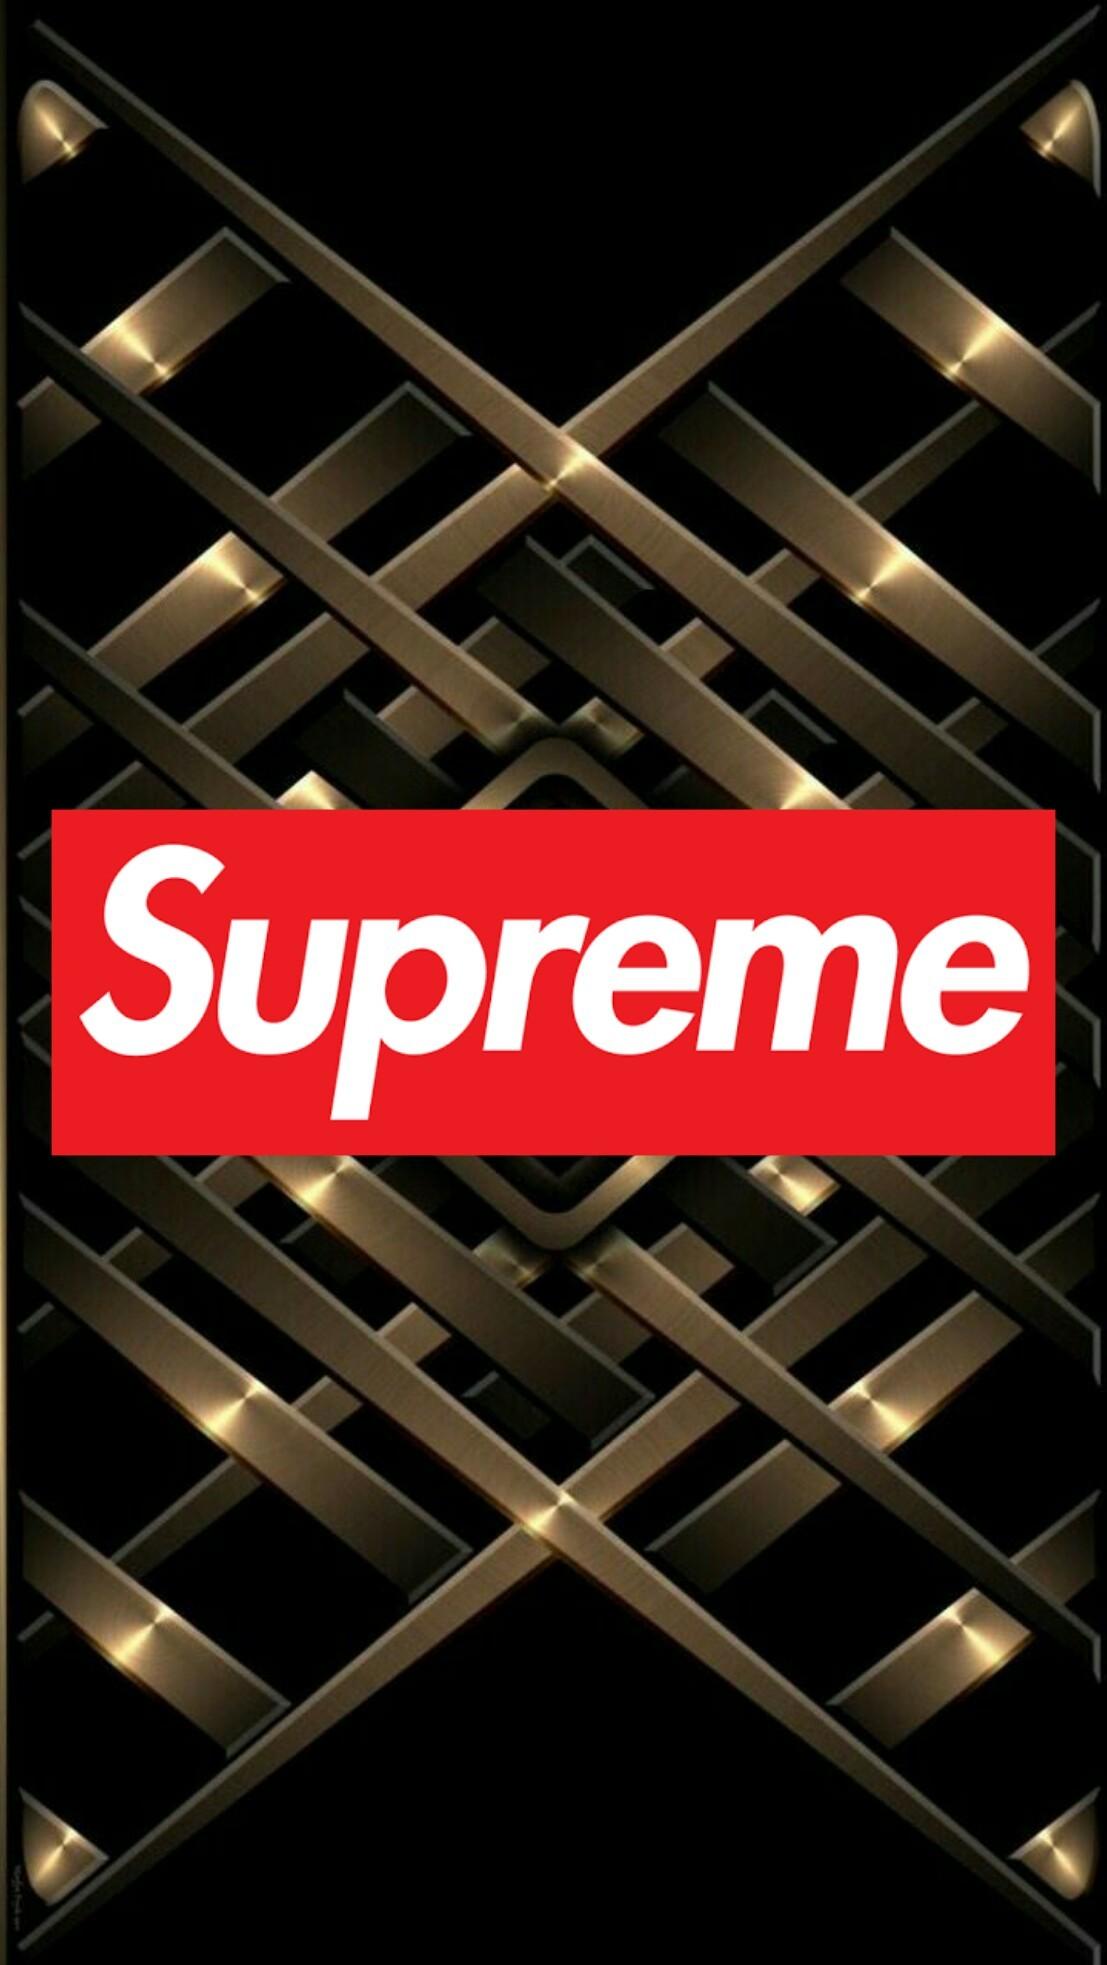 Supreme Iphone Wallpaper 4k 6 Iphone Cool Wallpapers Supreme 1107x1965 Download Hd Wallpaper Wallpapertip